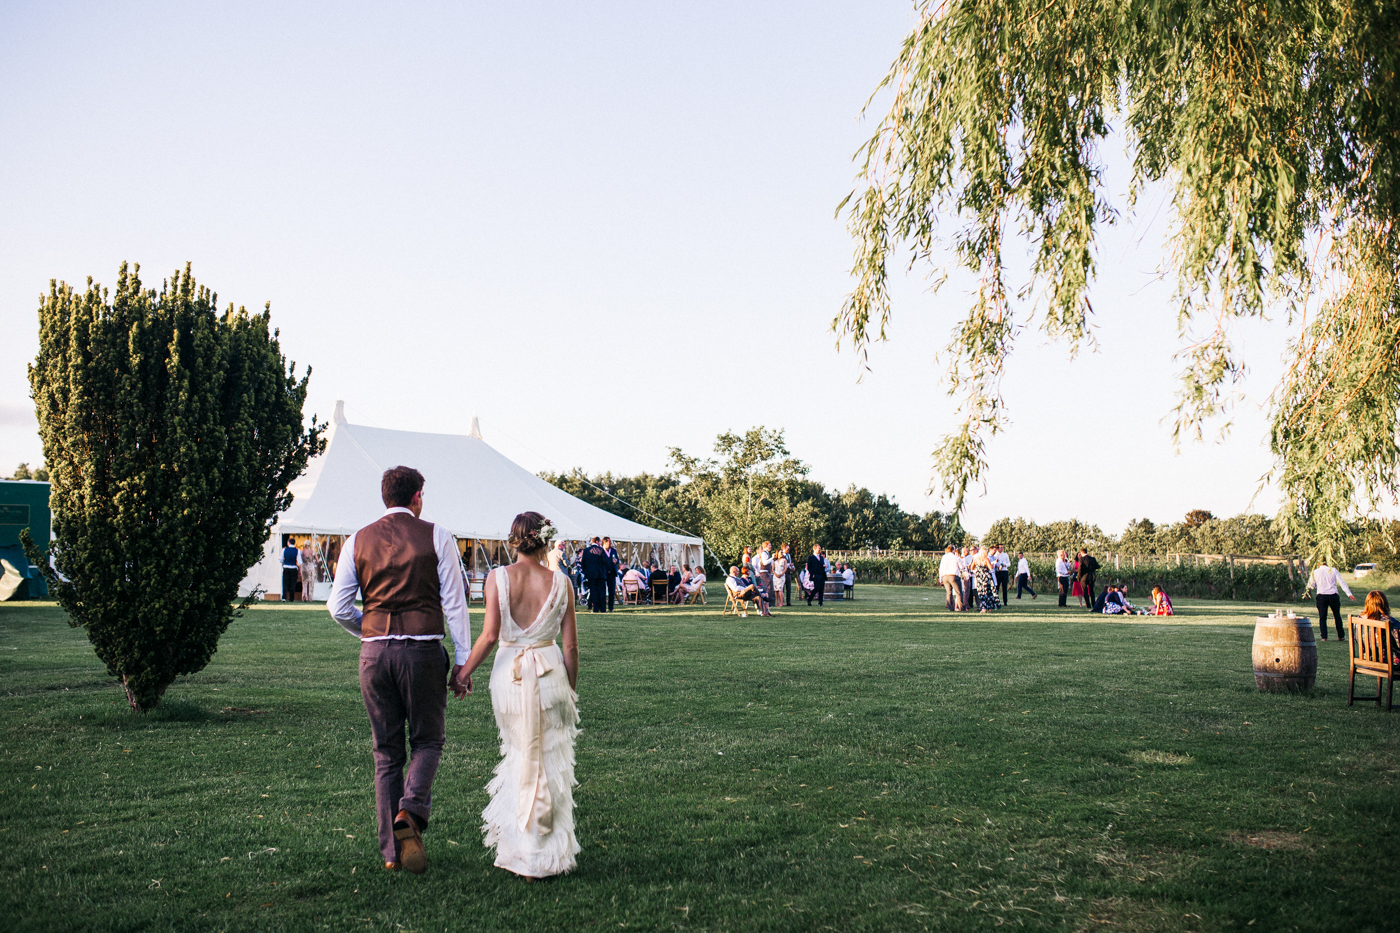 teesside-middlesbrough-north-east-wedding-photographer-creative-wedding-venues-0022.jpg